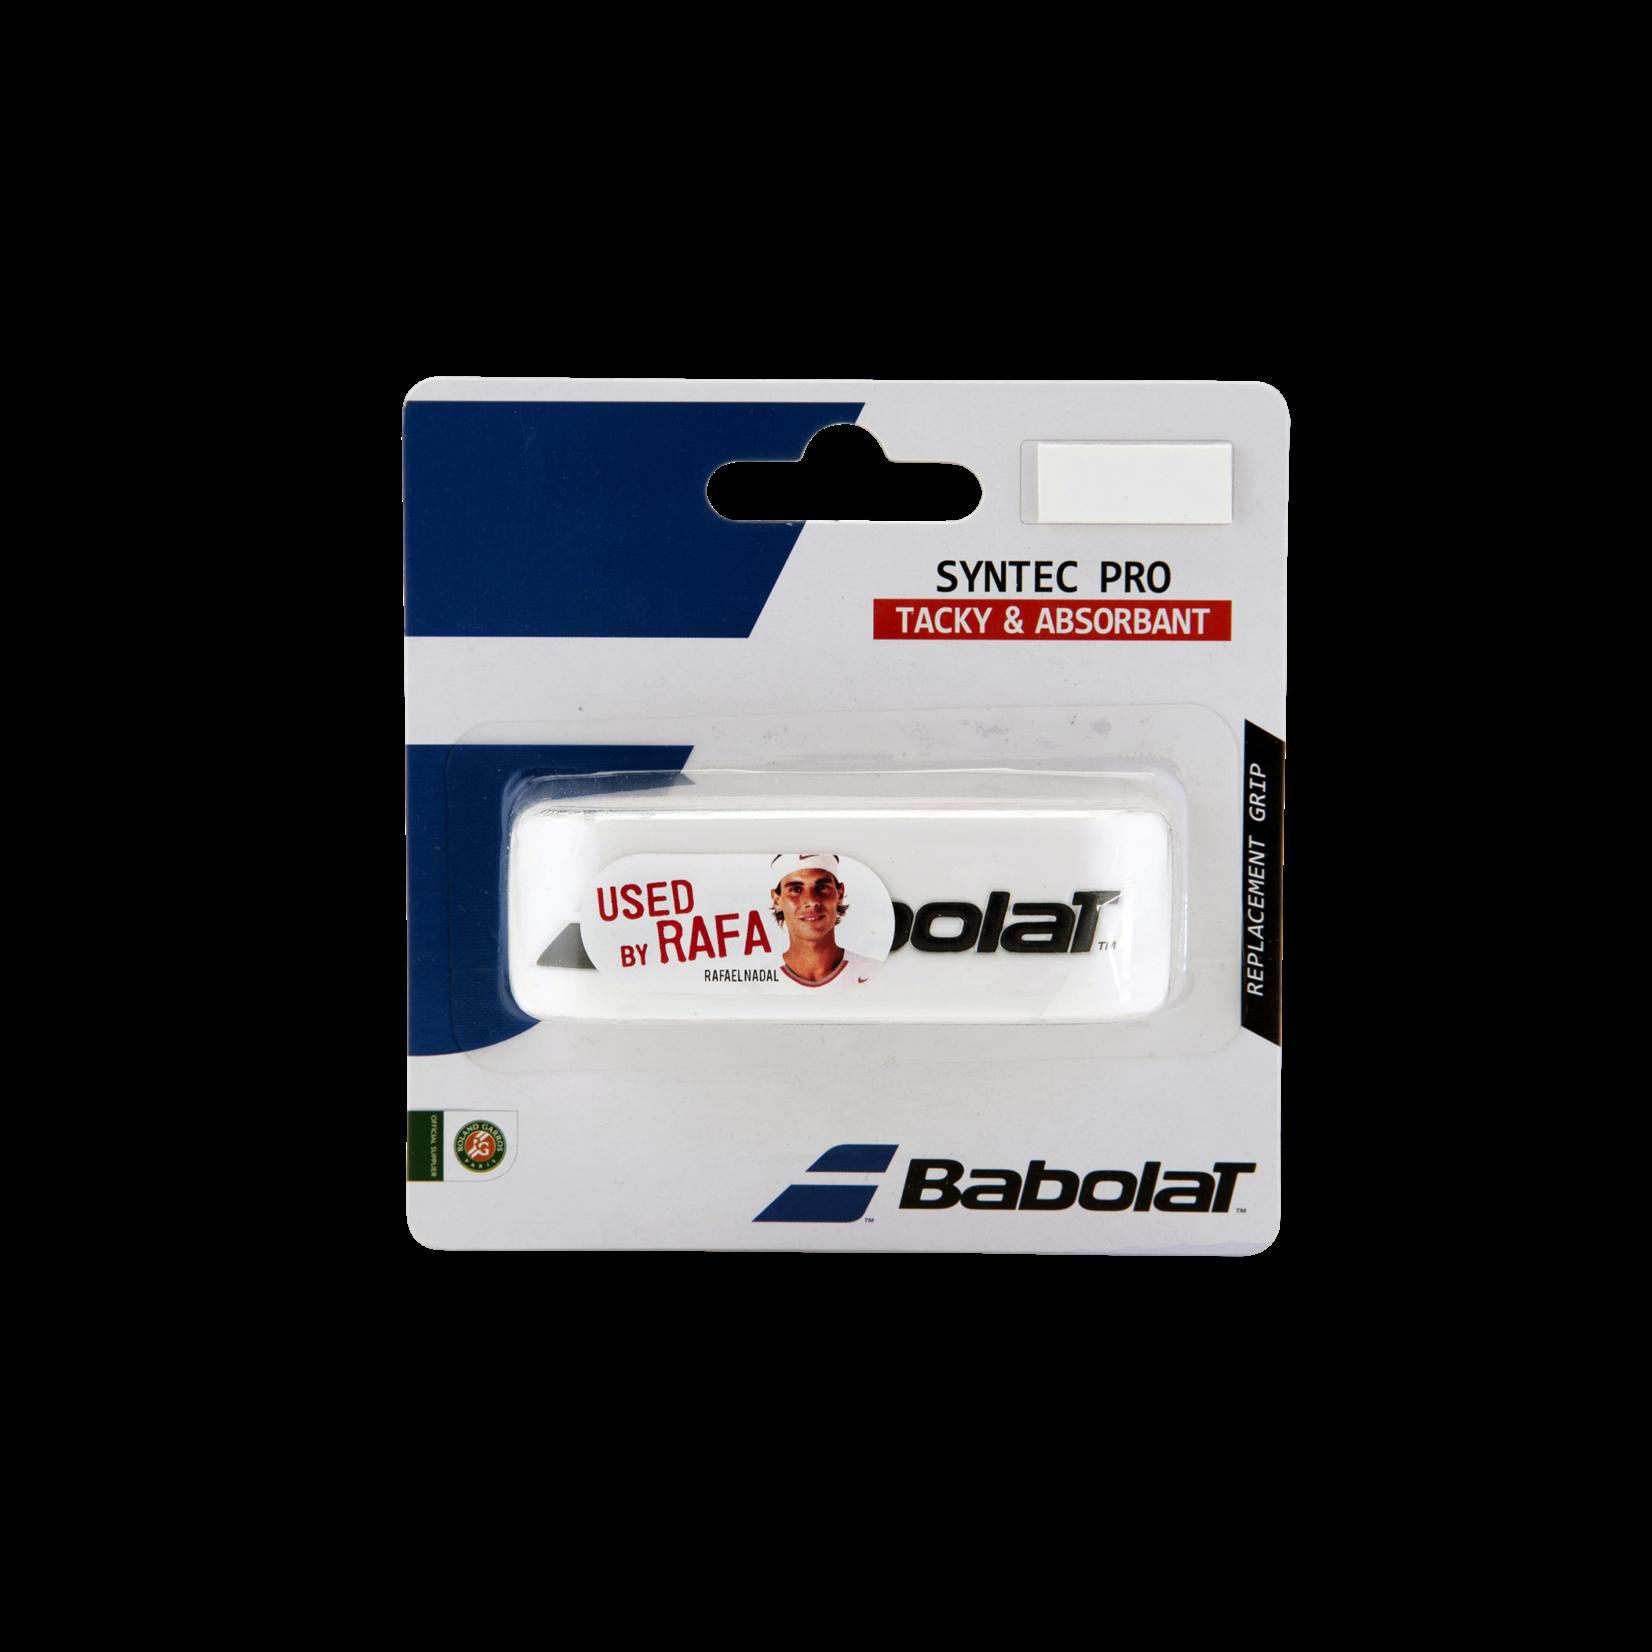 Babolat Syntec Pro